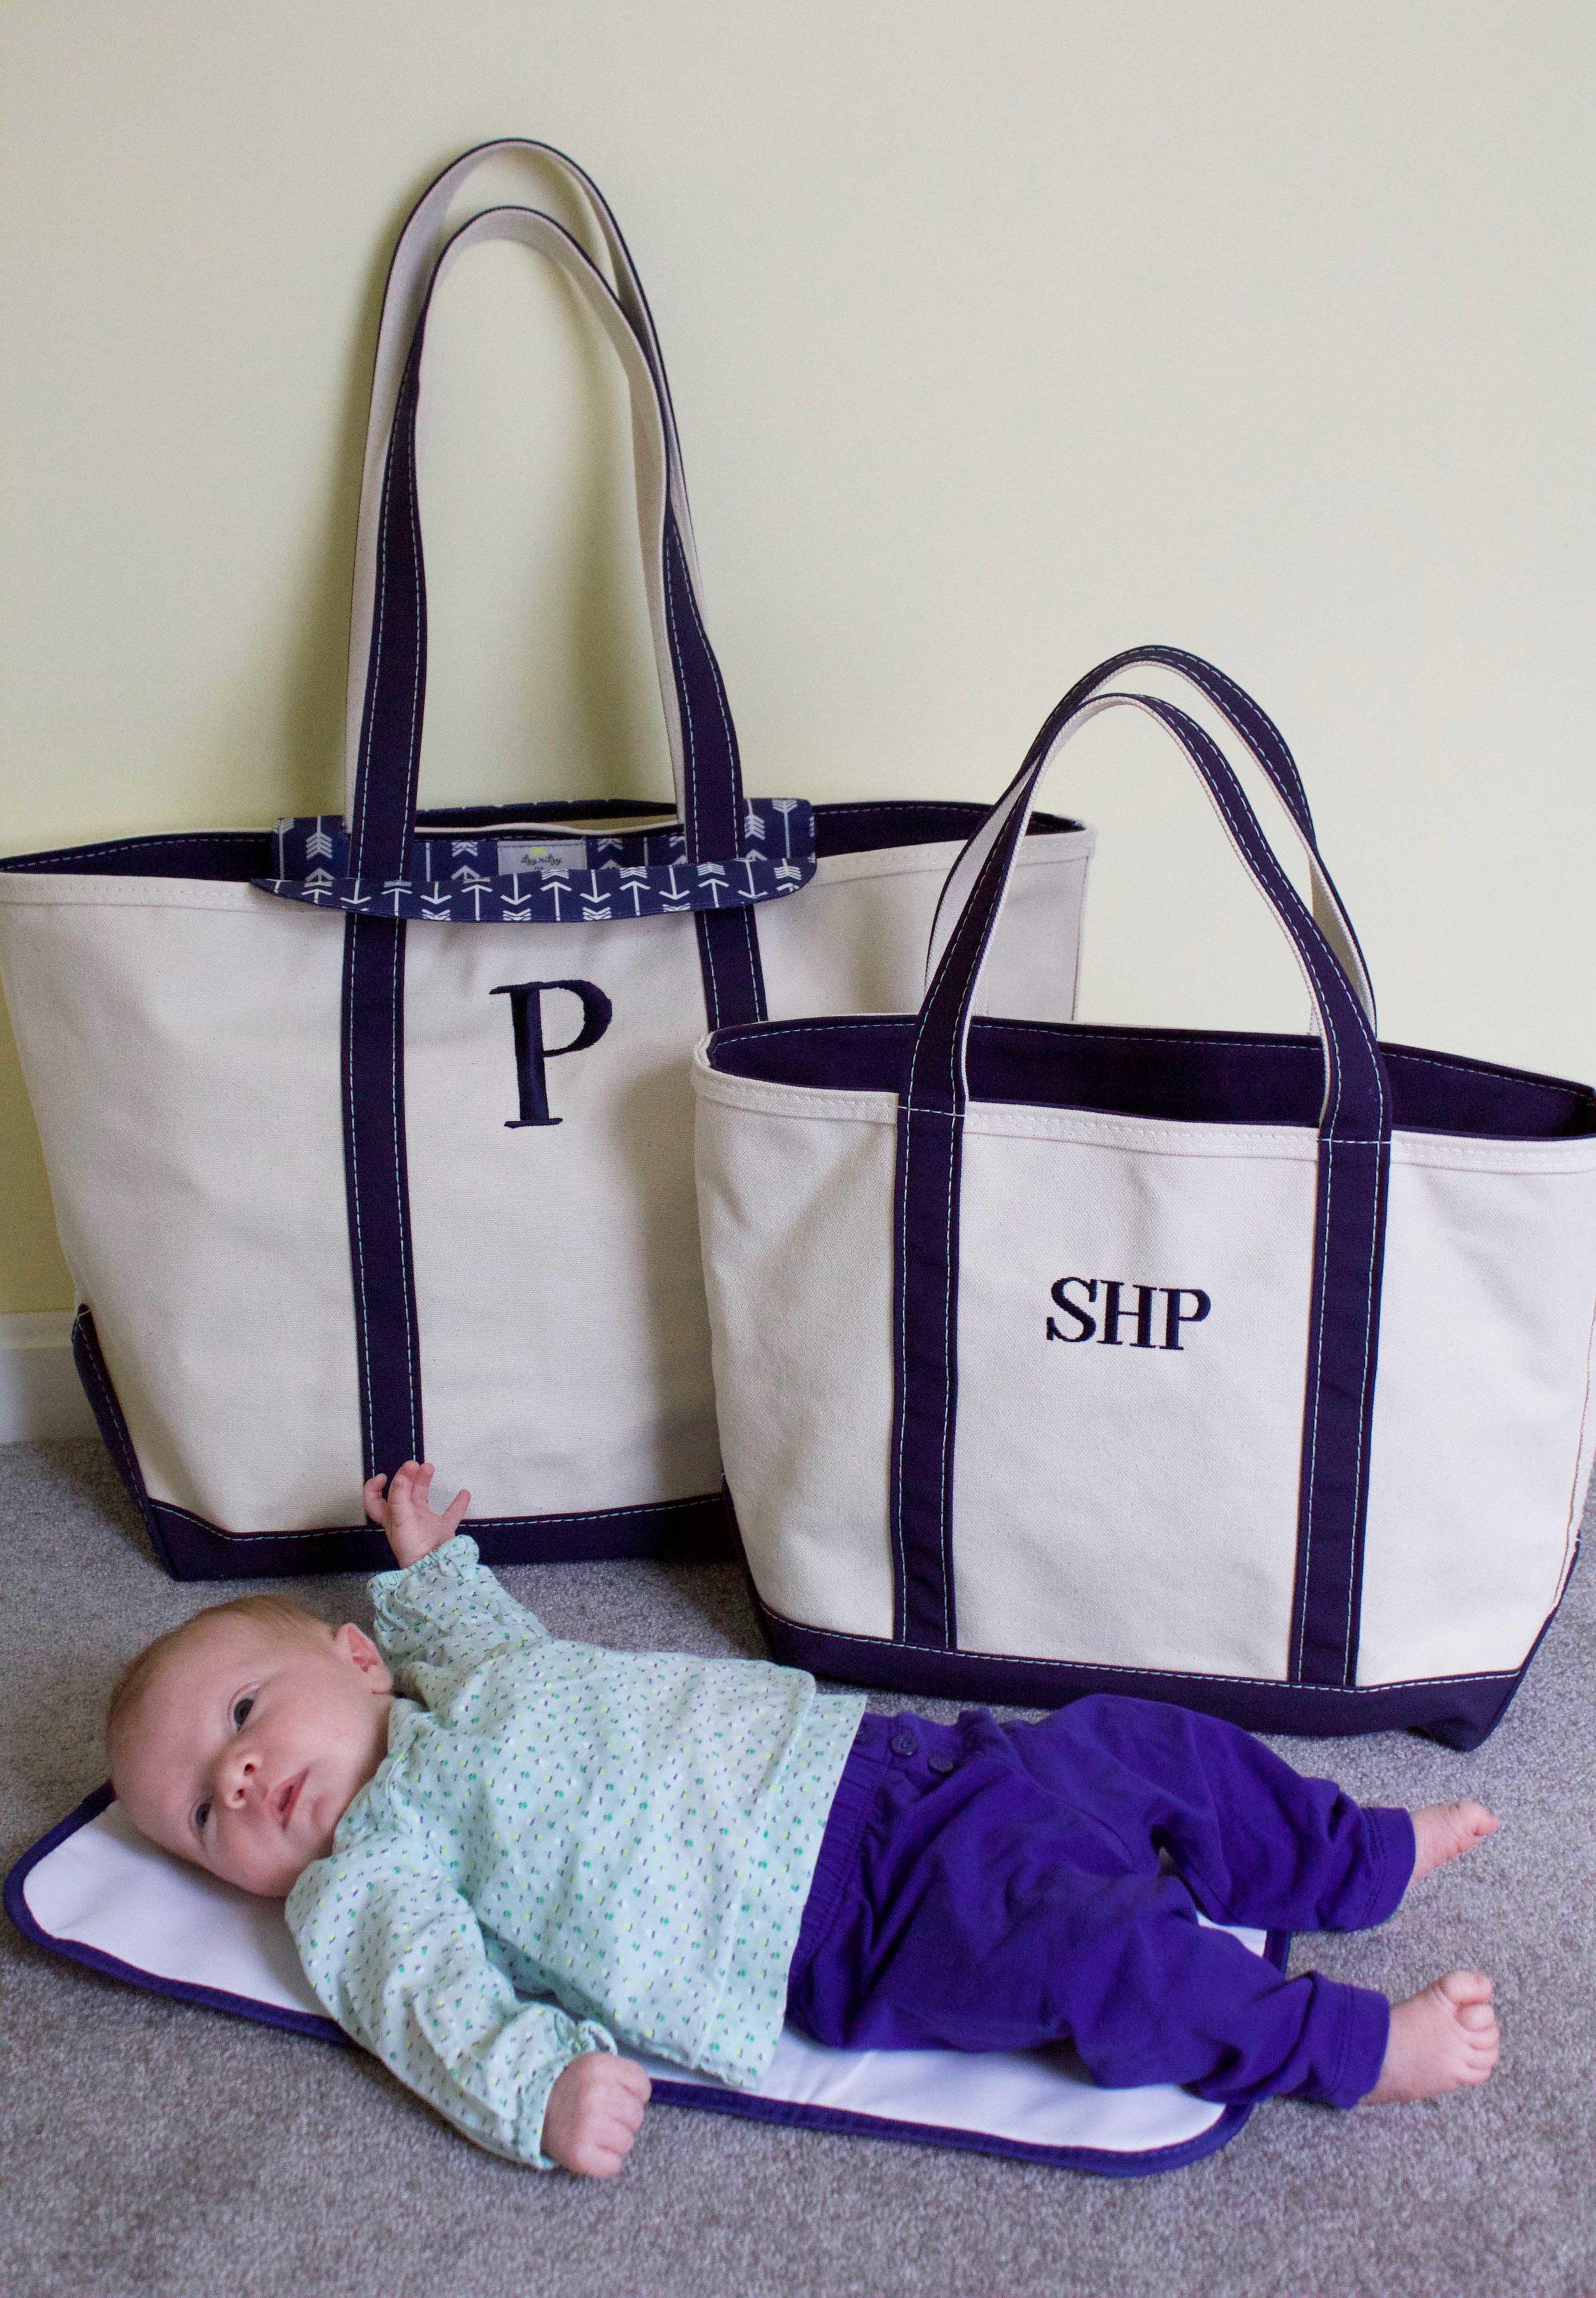 L.L. Bean Diaper Insert and Boat Tote Bags